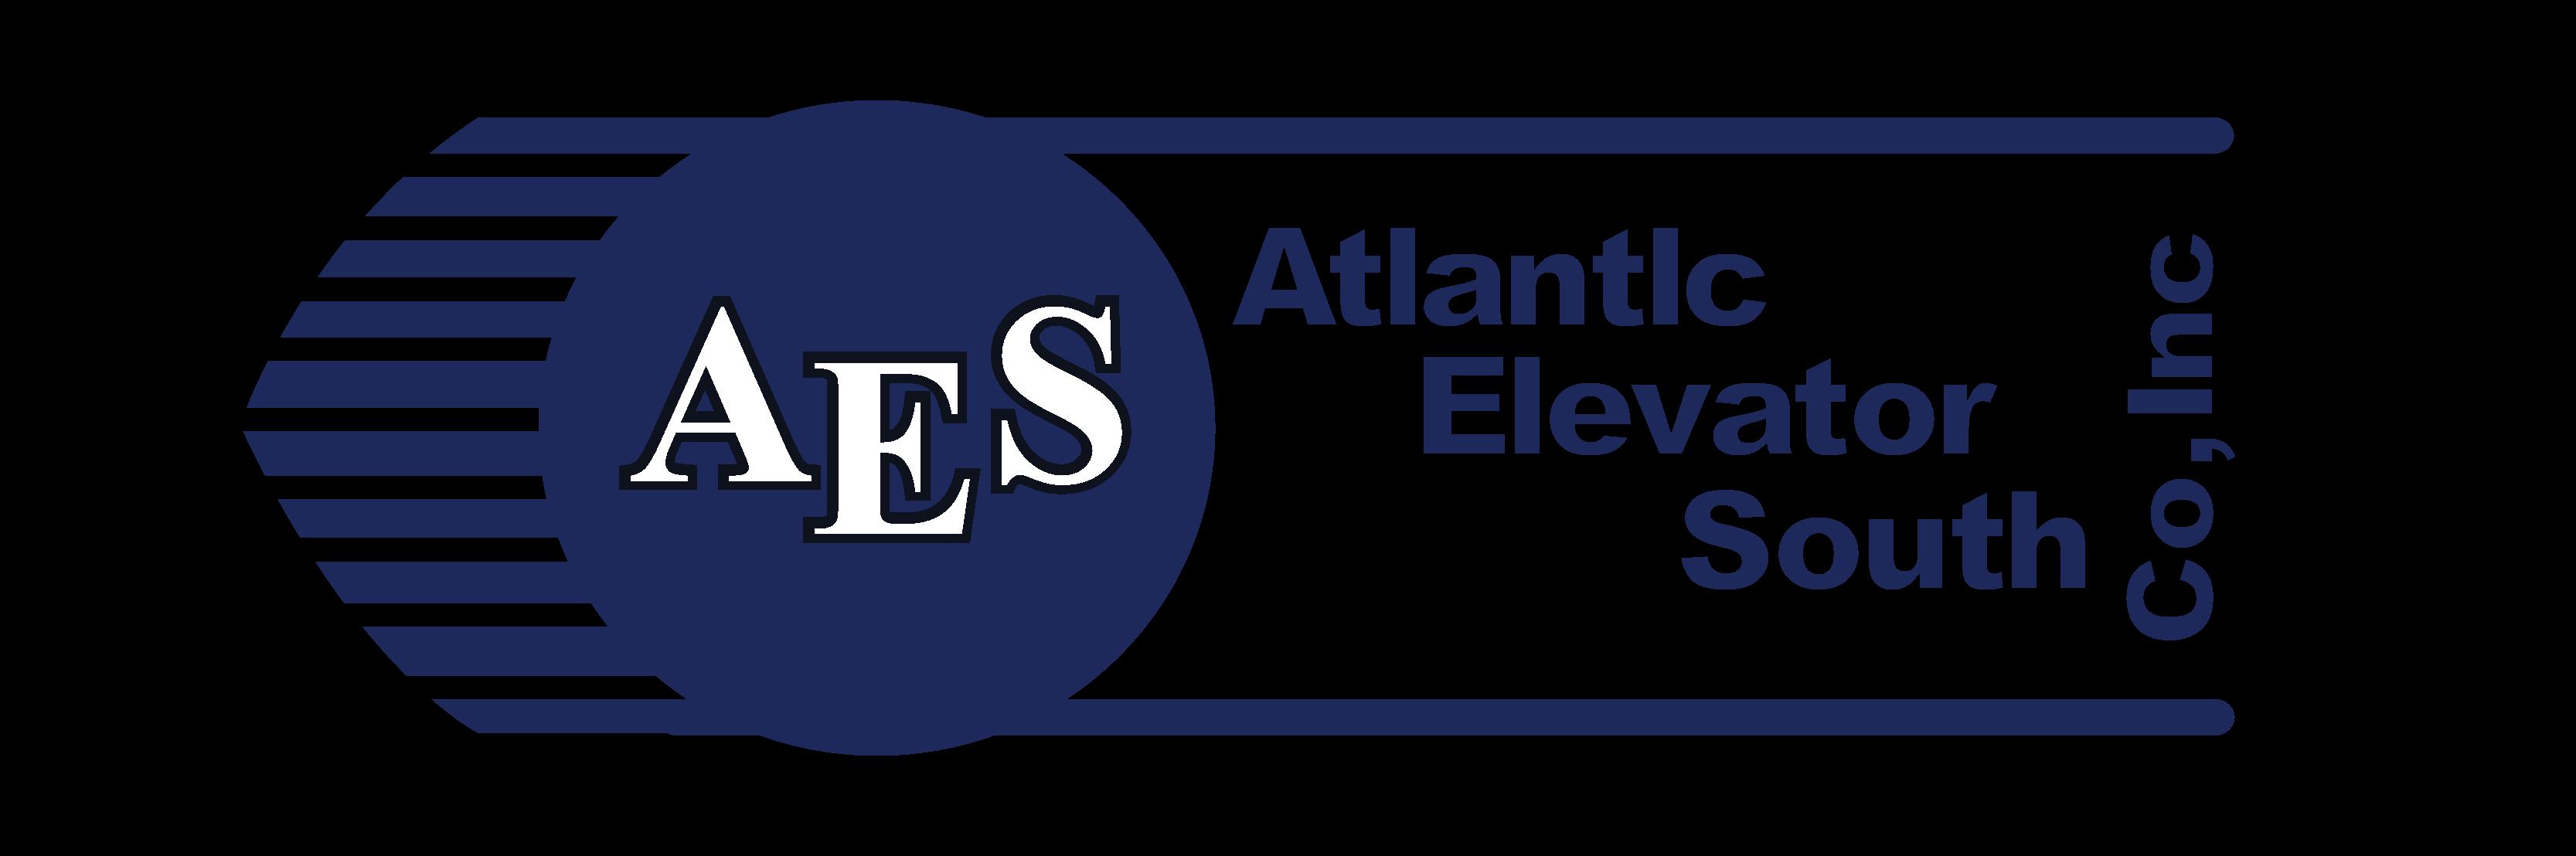 Atlanticelevatorsouth